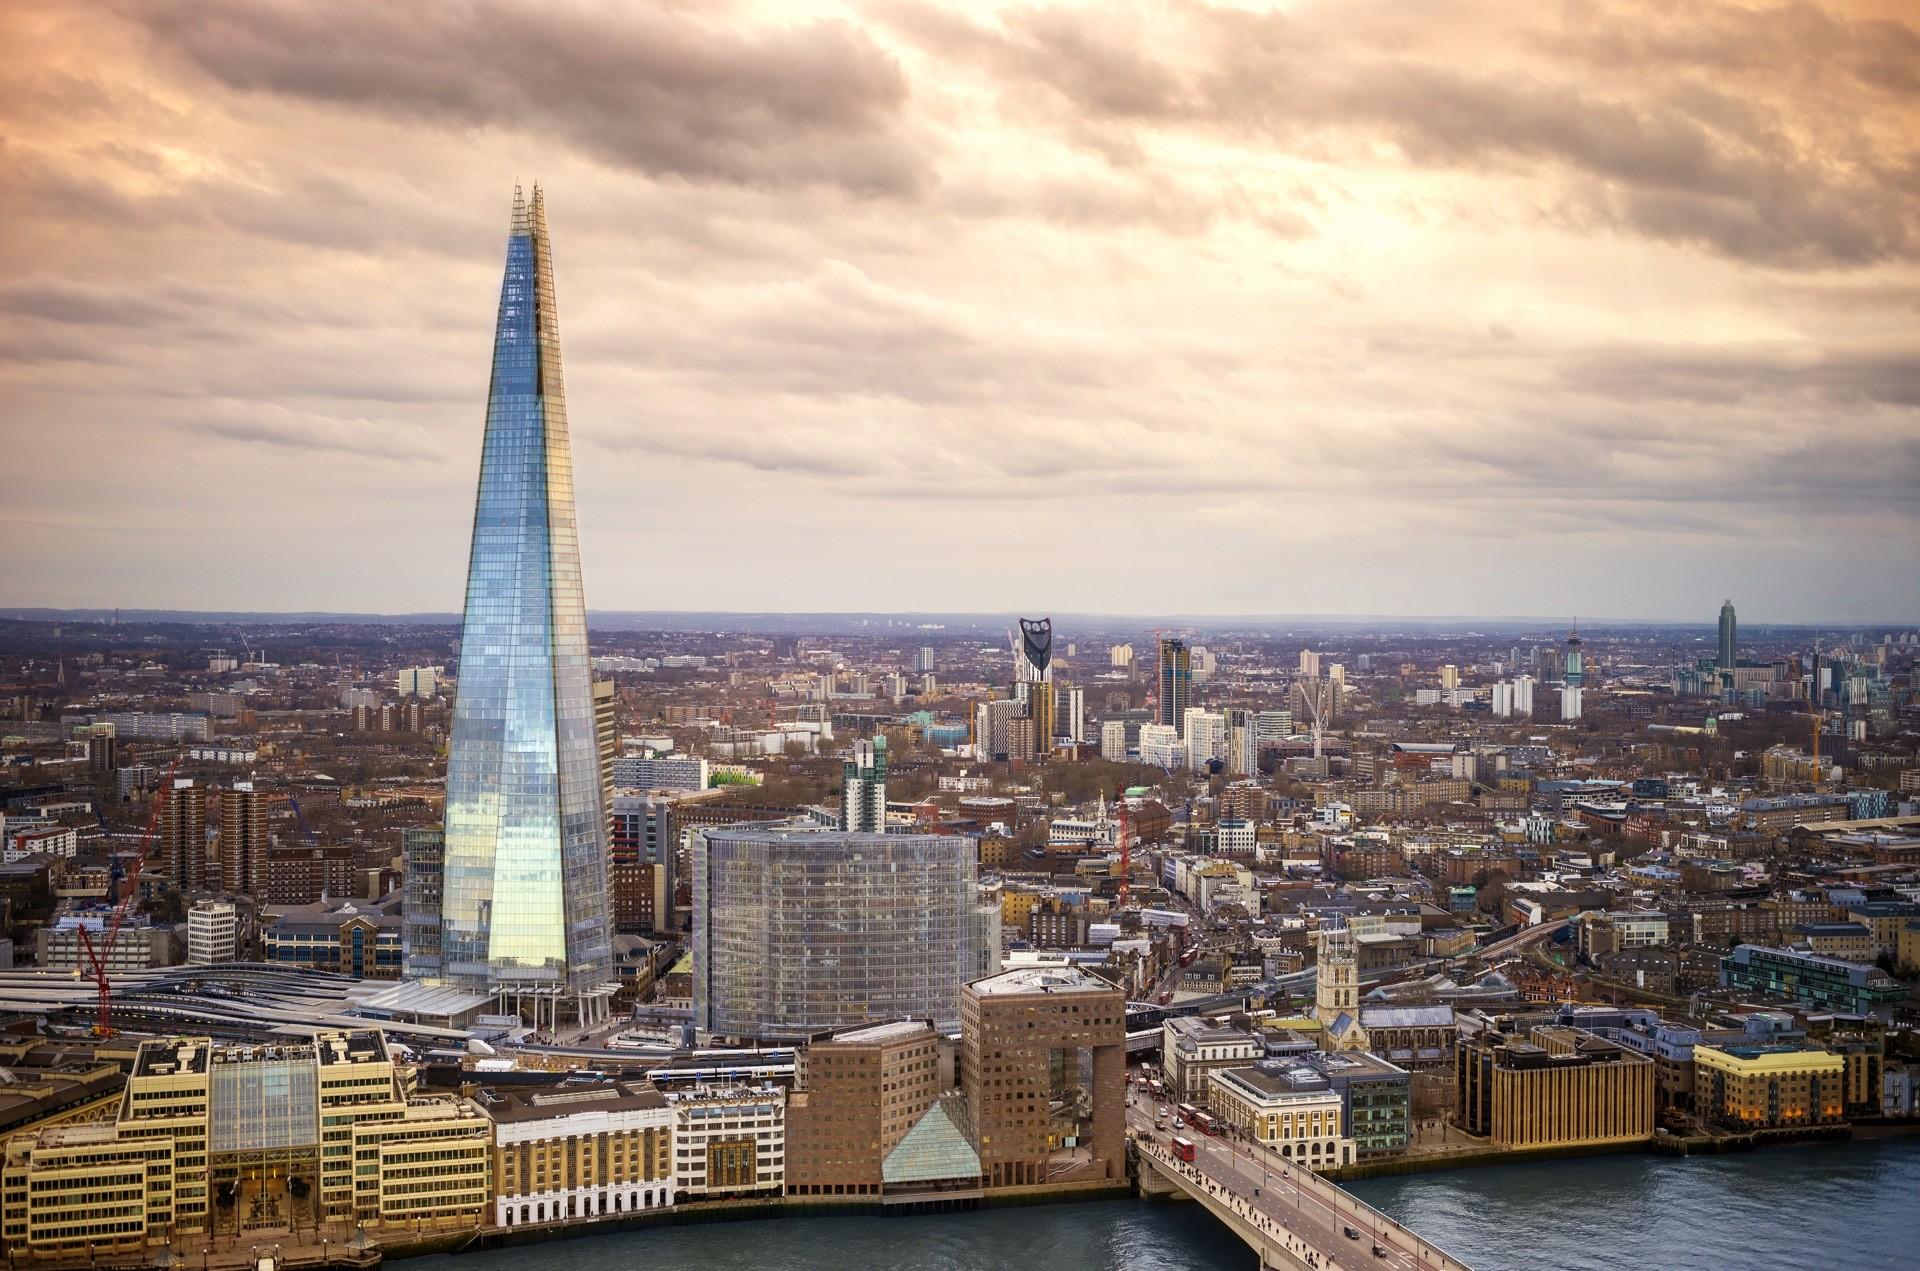 Heiratsantrag auf dem Londoner Shard of Glass